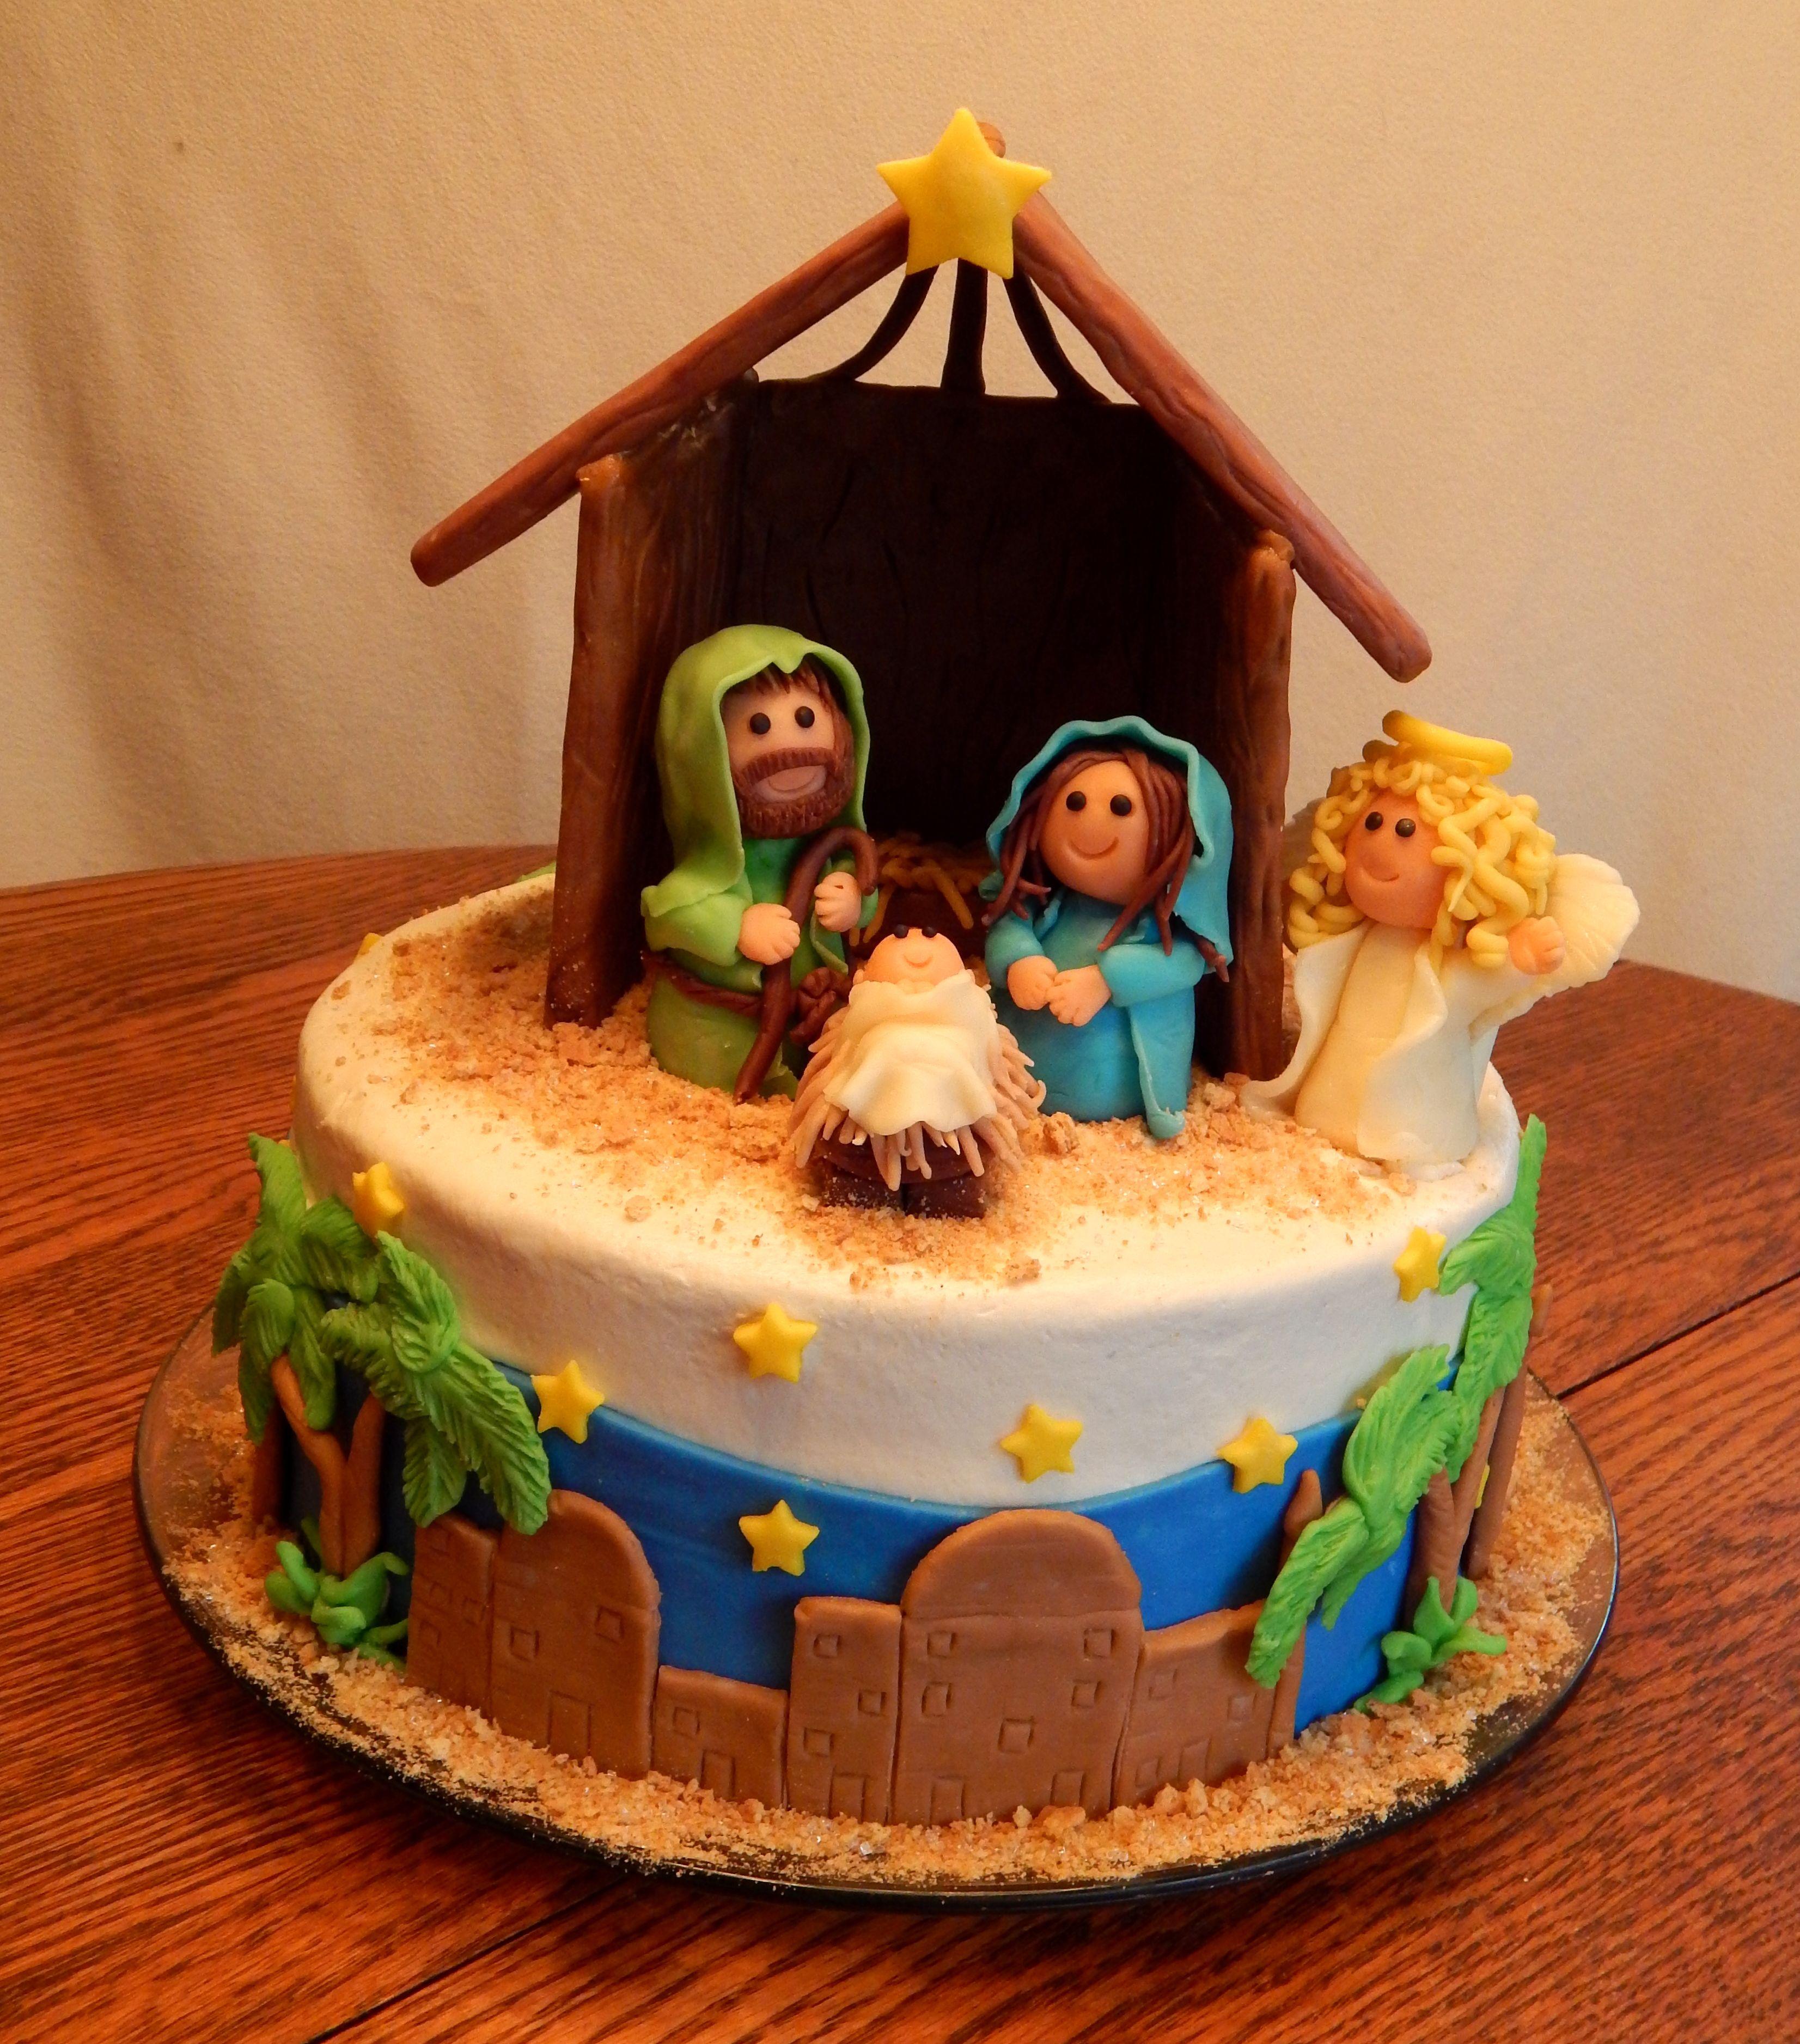 Happy Birthday Jesus!! A 10 inch round 2 layer cake with